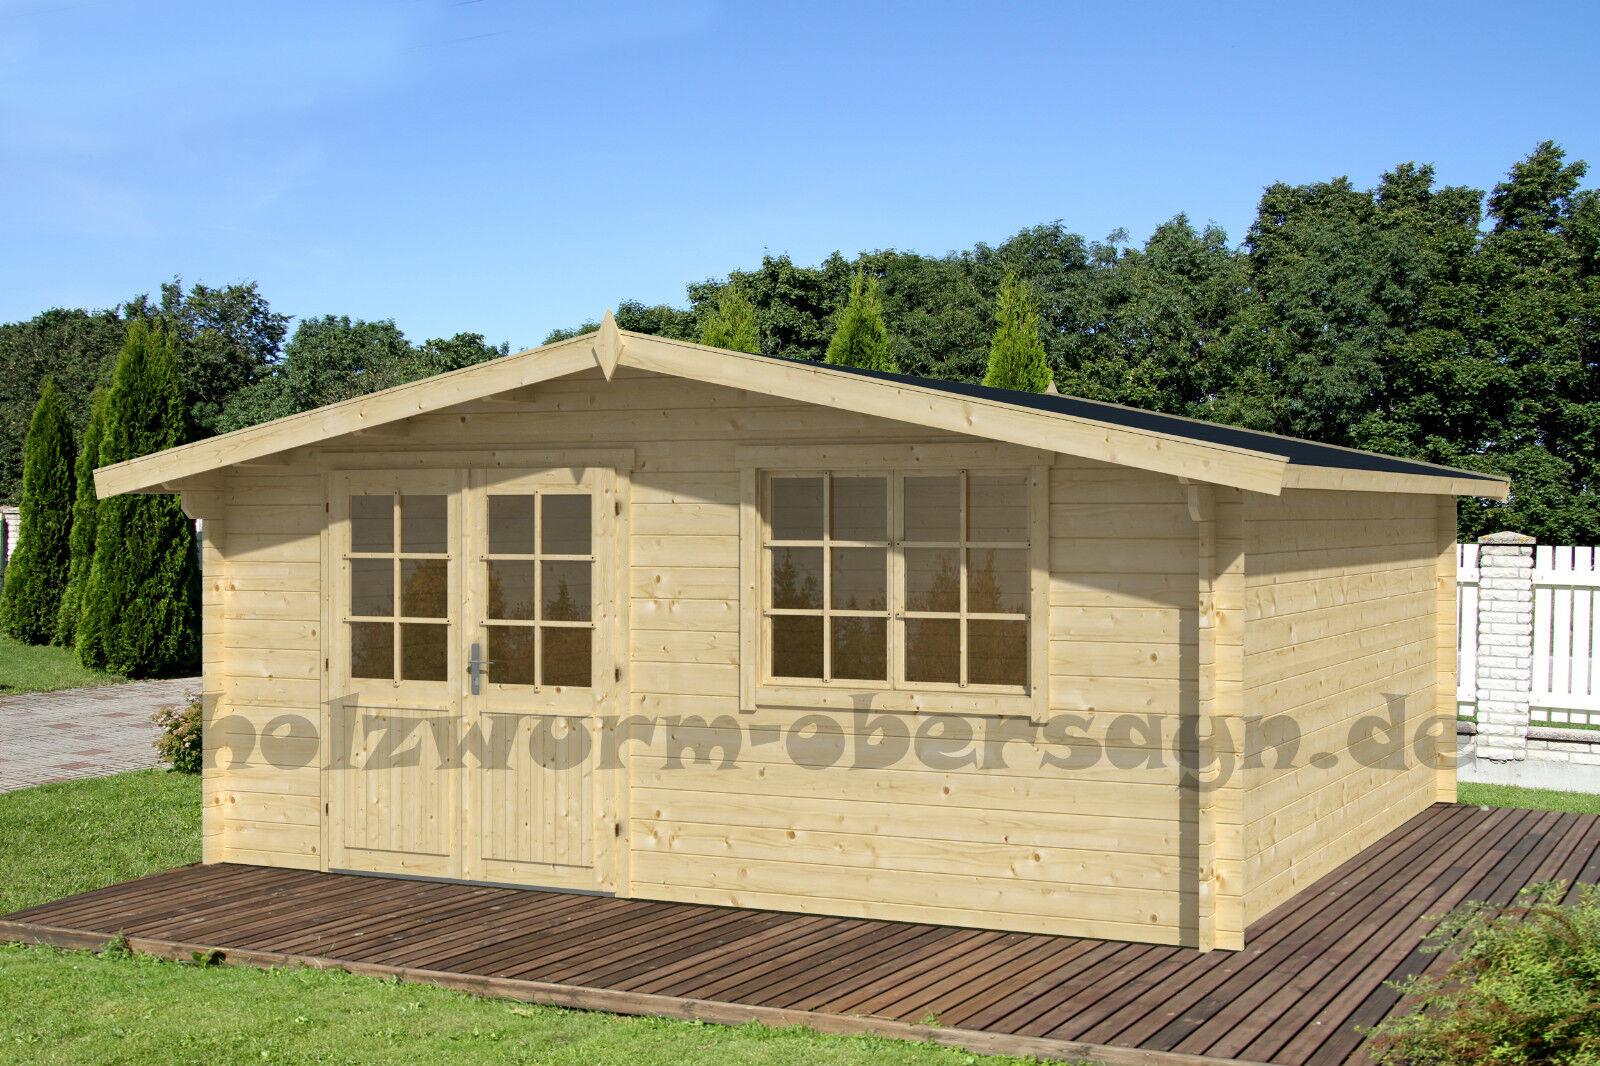 34 mm gartenhaus 500x400cm leipzig 6 ger tehaus holzhaus blockhaus holz freisitz ebay. Black Bedroom Furniture Sets. Home Design Ideas